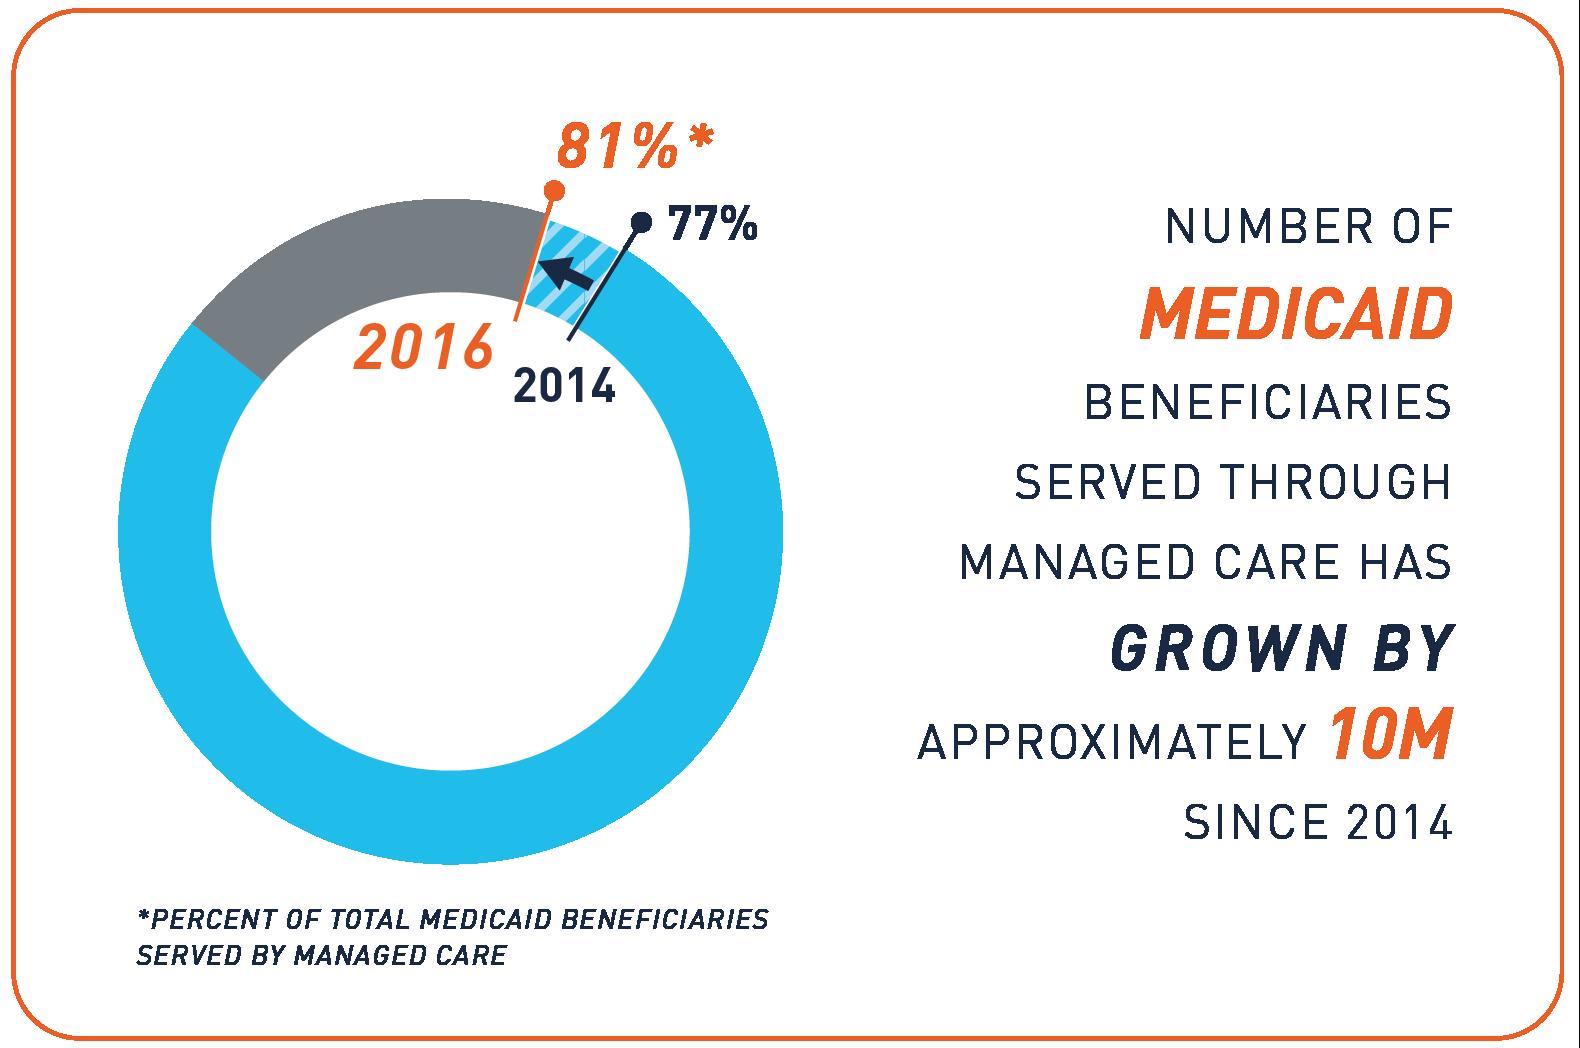 https://www.medicaid.gov/medicaid/managed-care/enrollment/index.html    https://www.kff.org/medicaid/state-indicator/total-medicaid-mc-enrollment/?activeTab=graph&currentTimeframe=0&startTimeframe=2&selectedDistributions=total-medicaid-managed-care-enrollment&selectedRows=%7B%22wrapups%22:%7B%22united-states%22:%7B%7D%7D%7D&sortModel=%7B%22colId%22:%22Location%22,%22sort%22:%22asc%22%7D